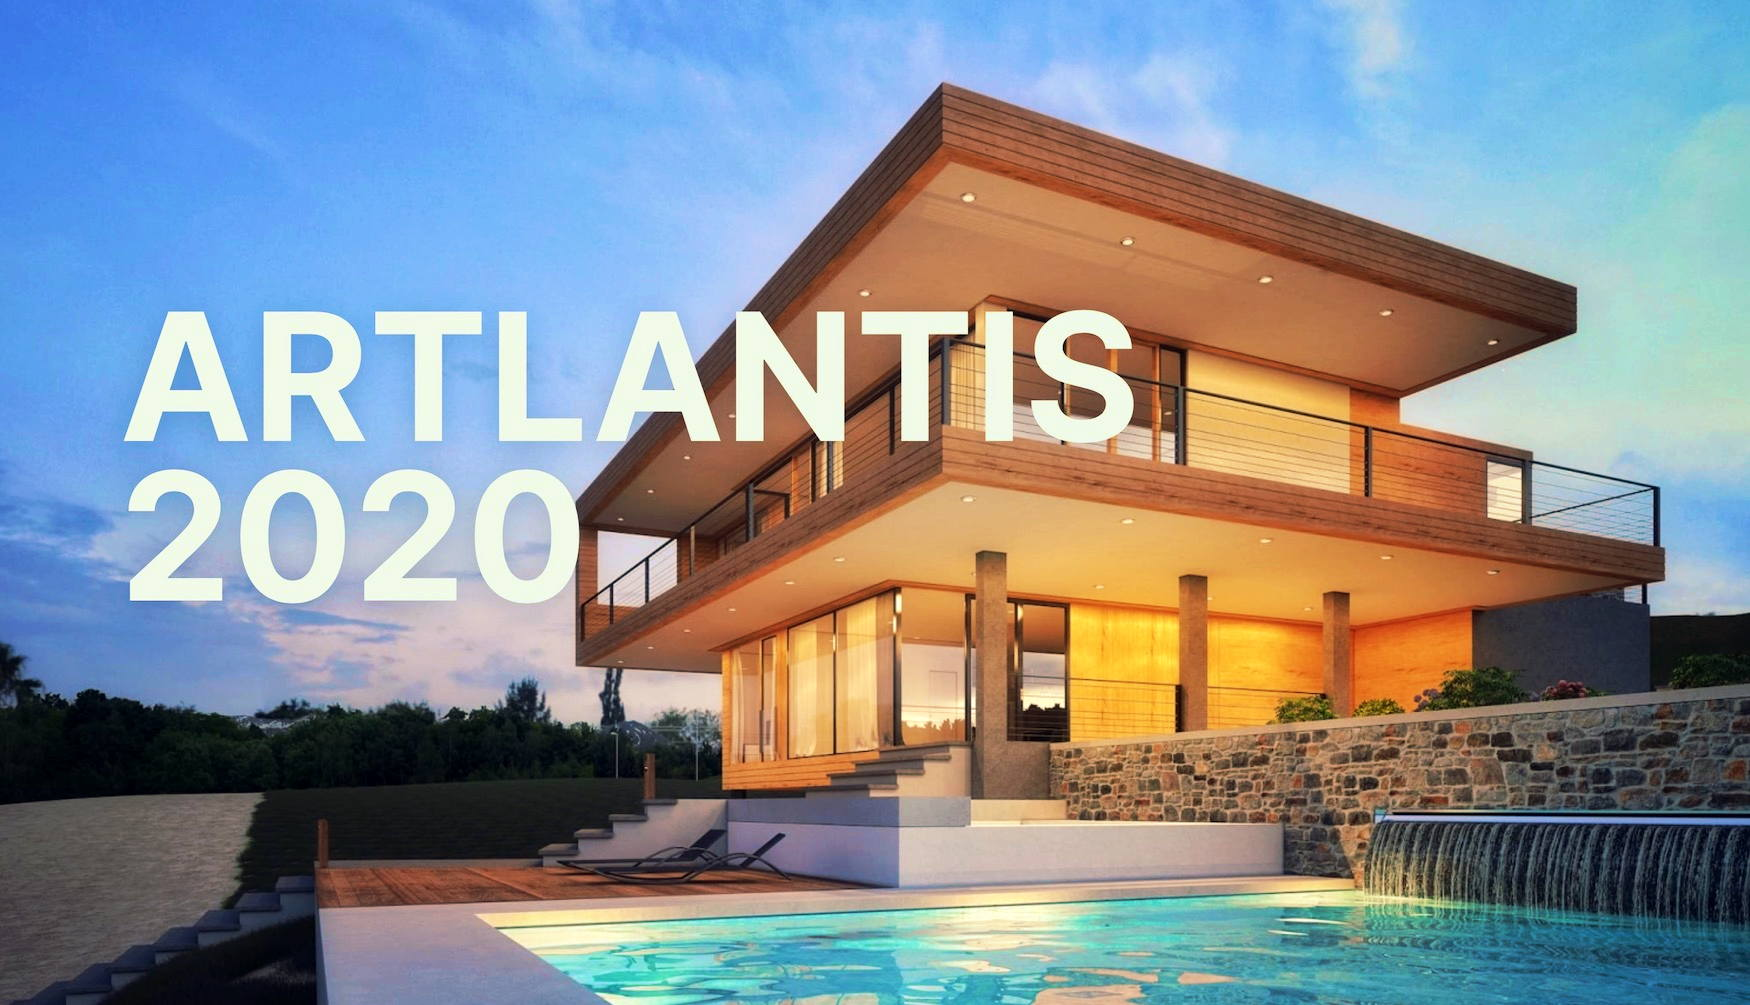 Artlantis Rendering mit Archicad